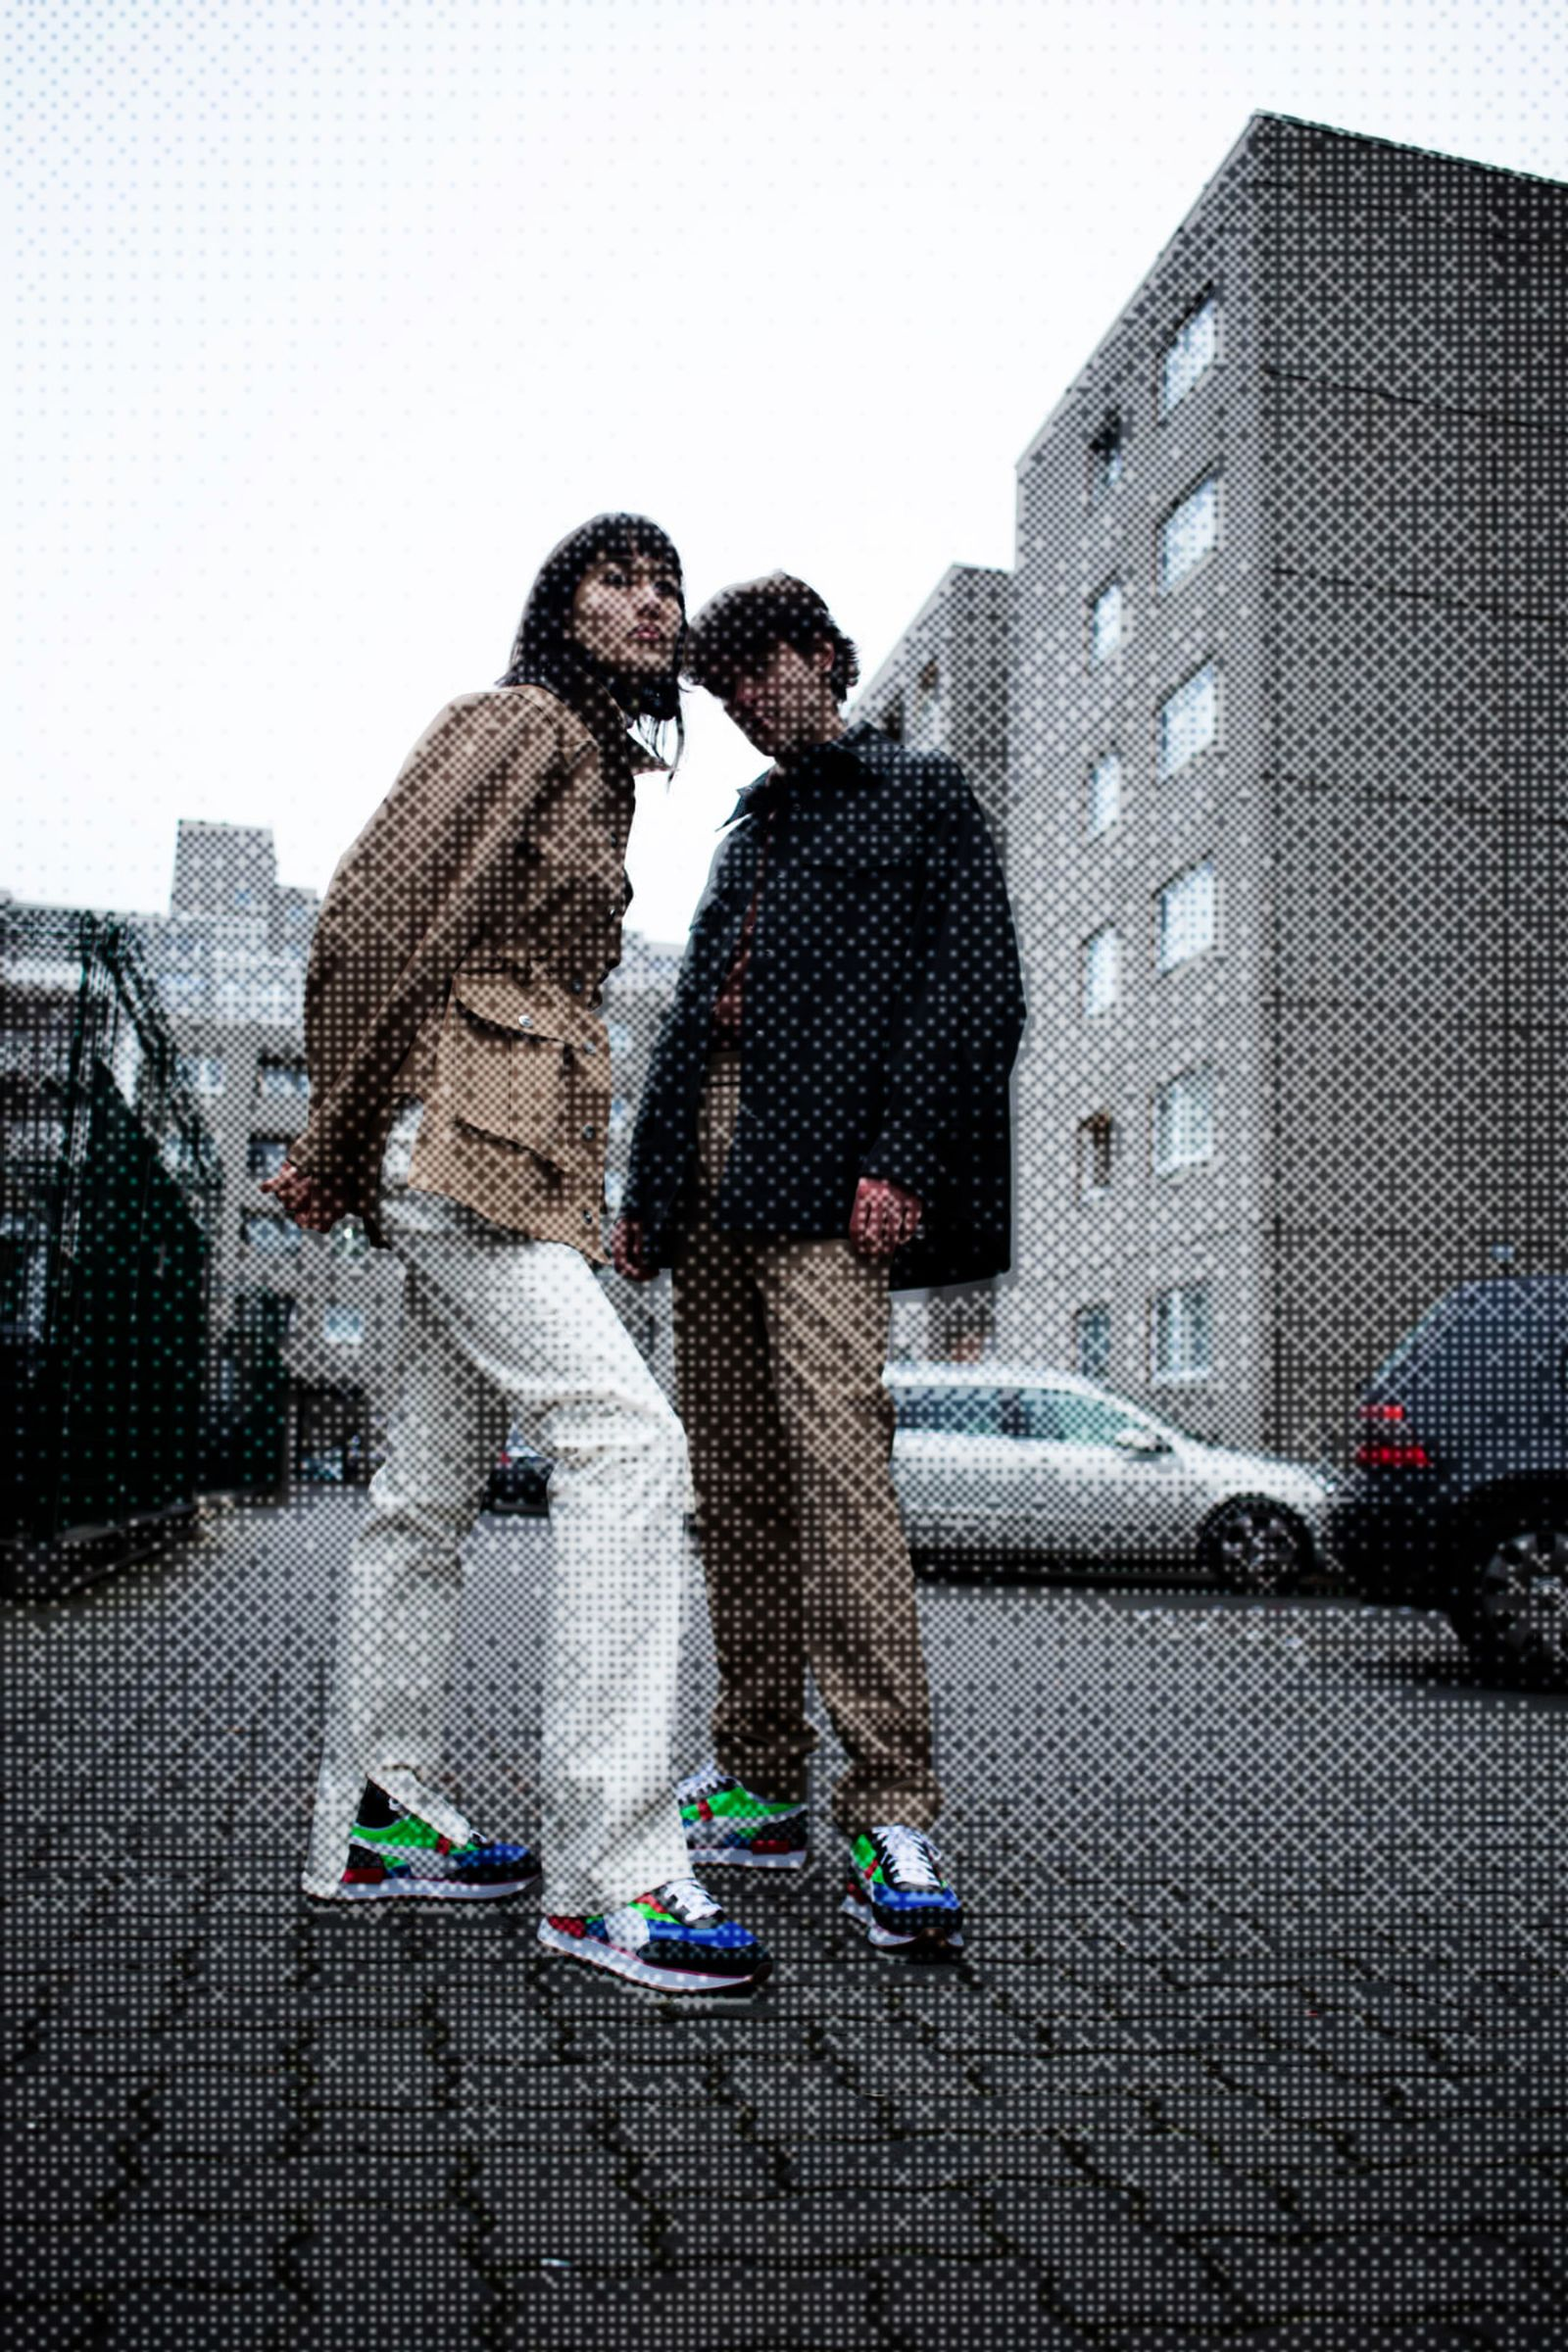 puma-future-rider-sneaker-release-date-price-02